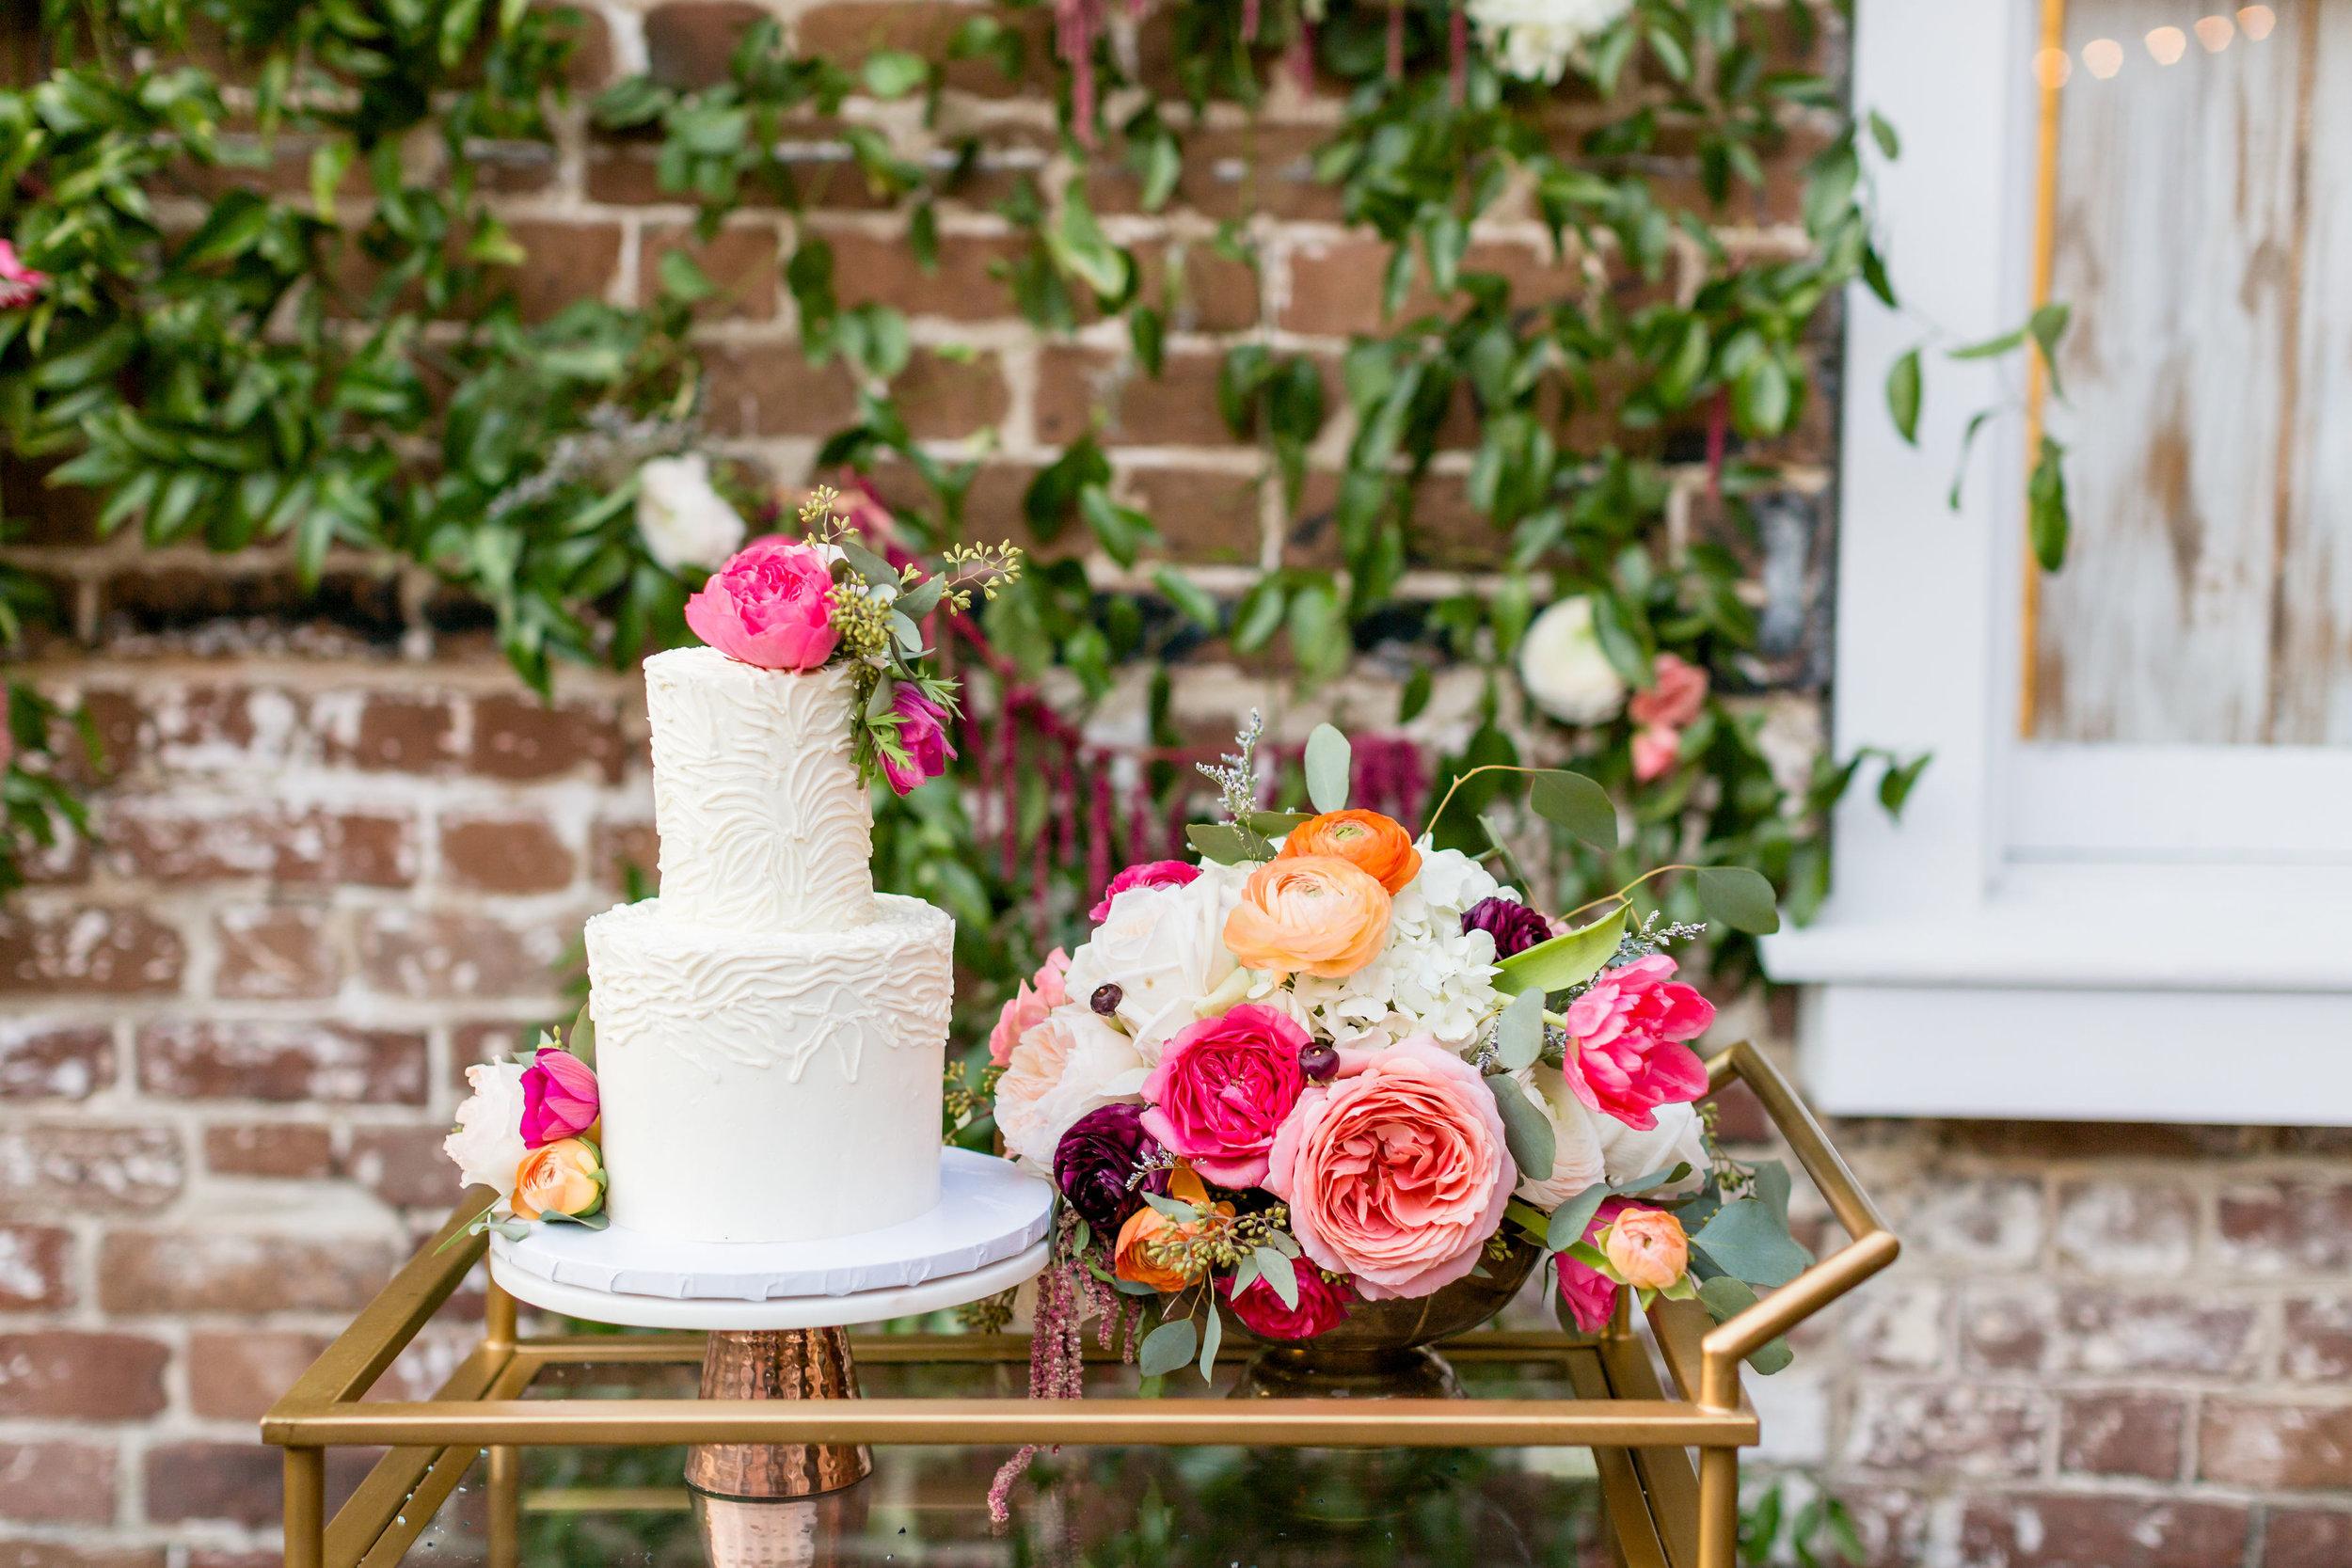 charleston new years elopement popup surprise wedding at upstairs at midtown - scarlet plan & design wedding planners (238).jpg